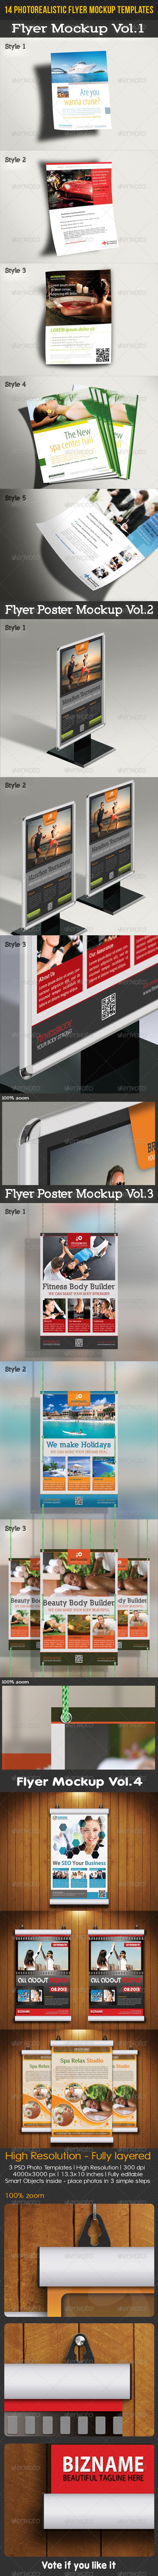 GraphicRiver 14 Flyer Mockup Templates Bundle 8021404